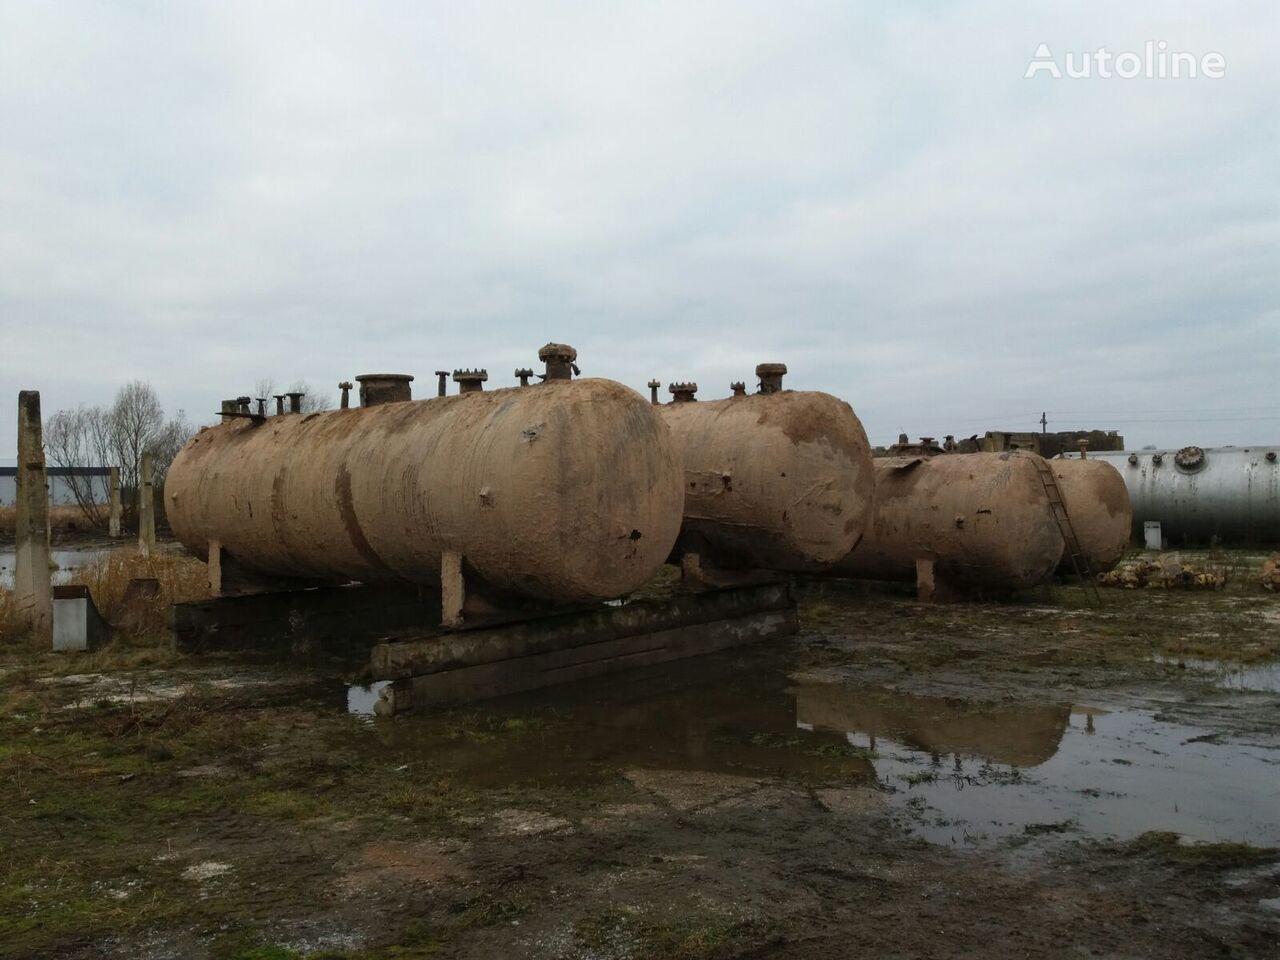 gaasitsistern 25000 liter storage tanks. 4 units